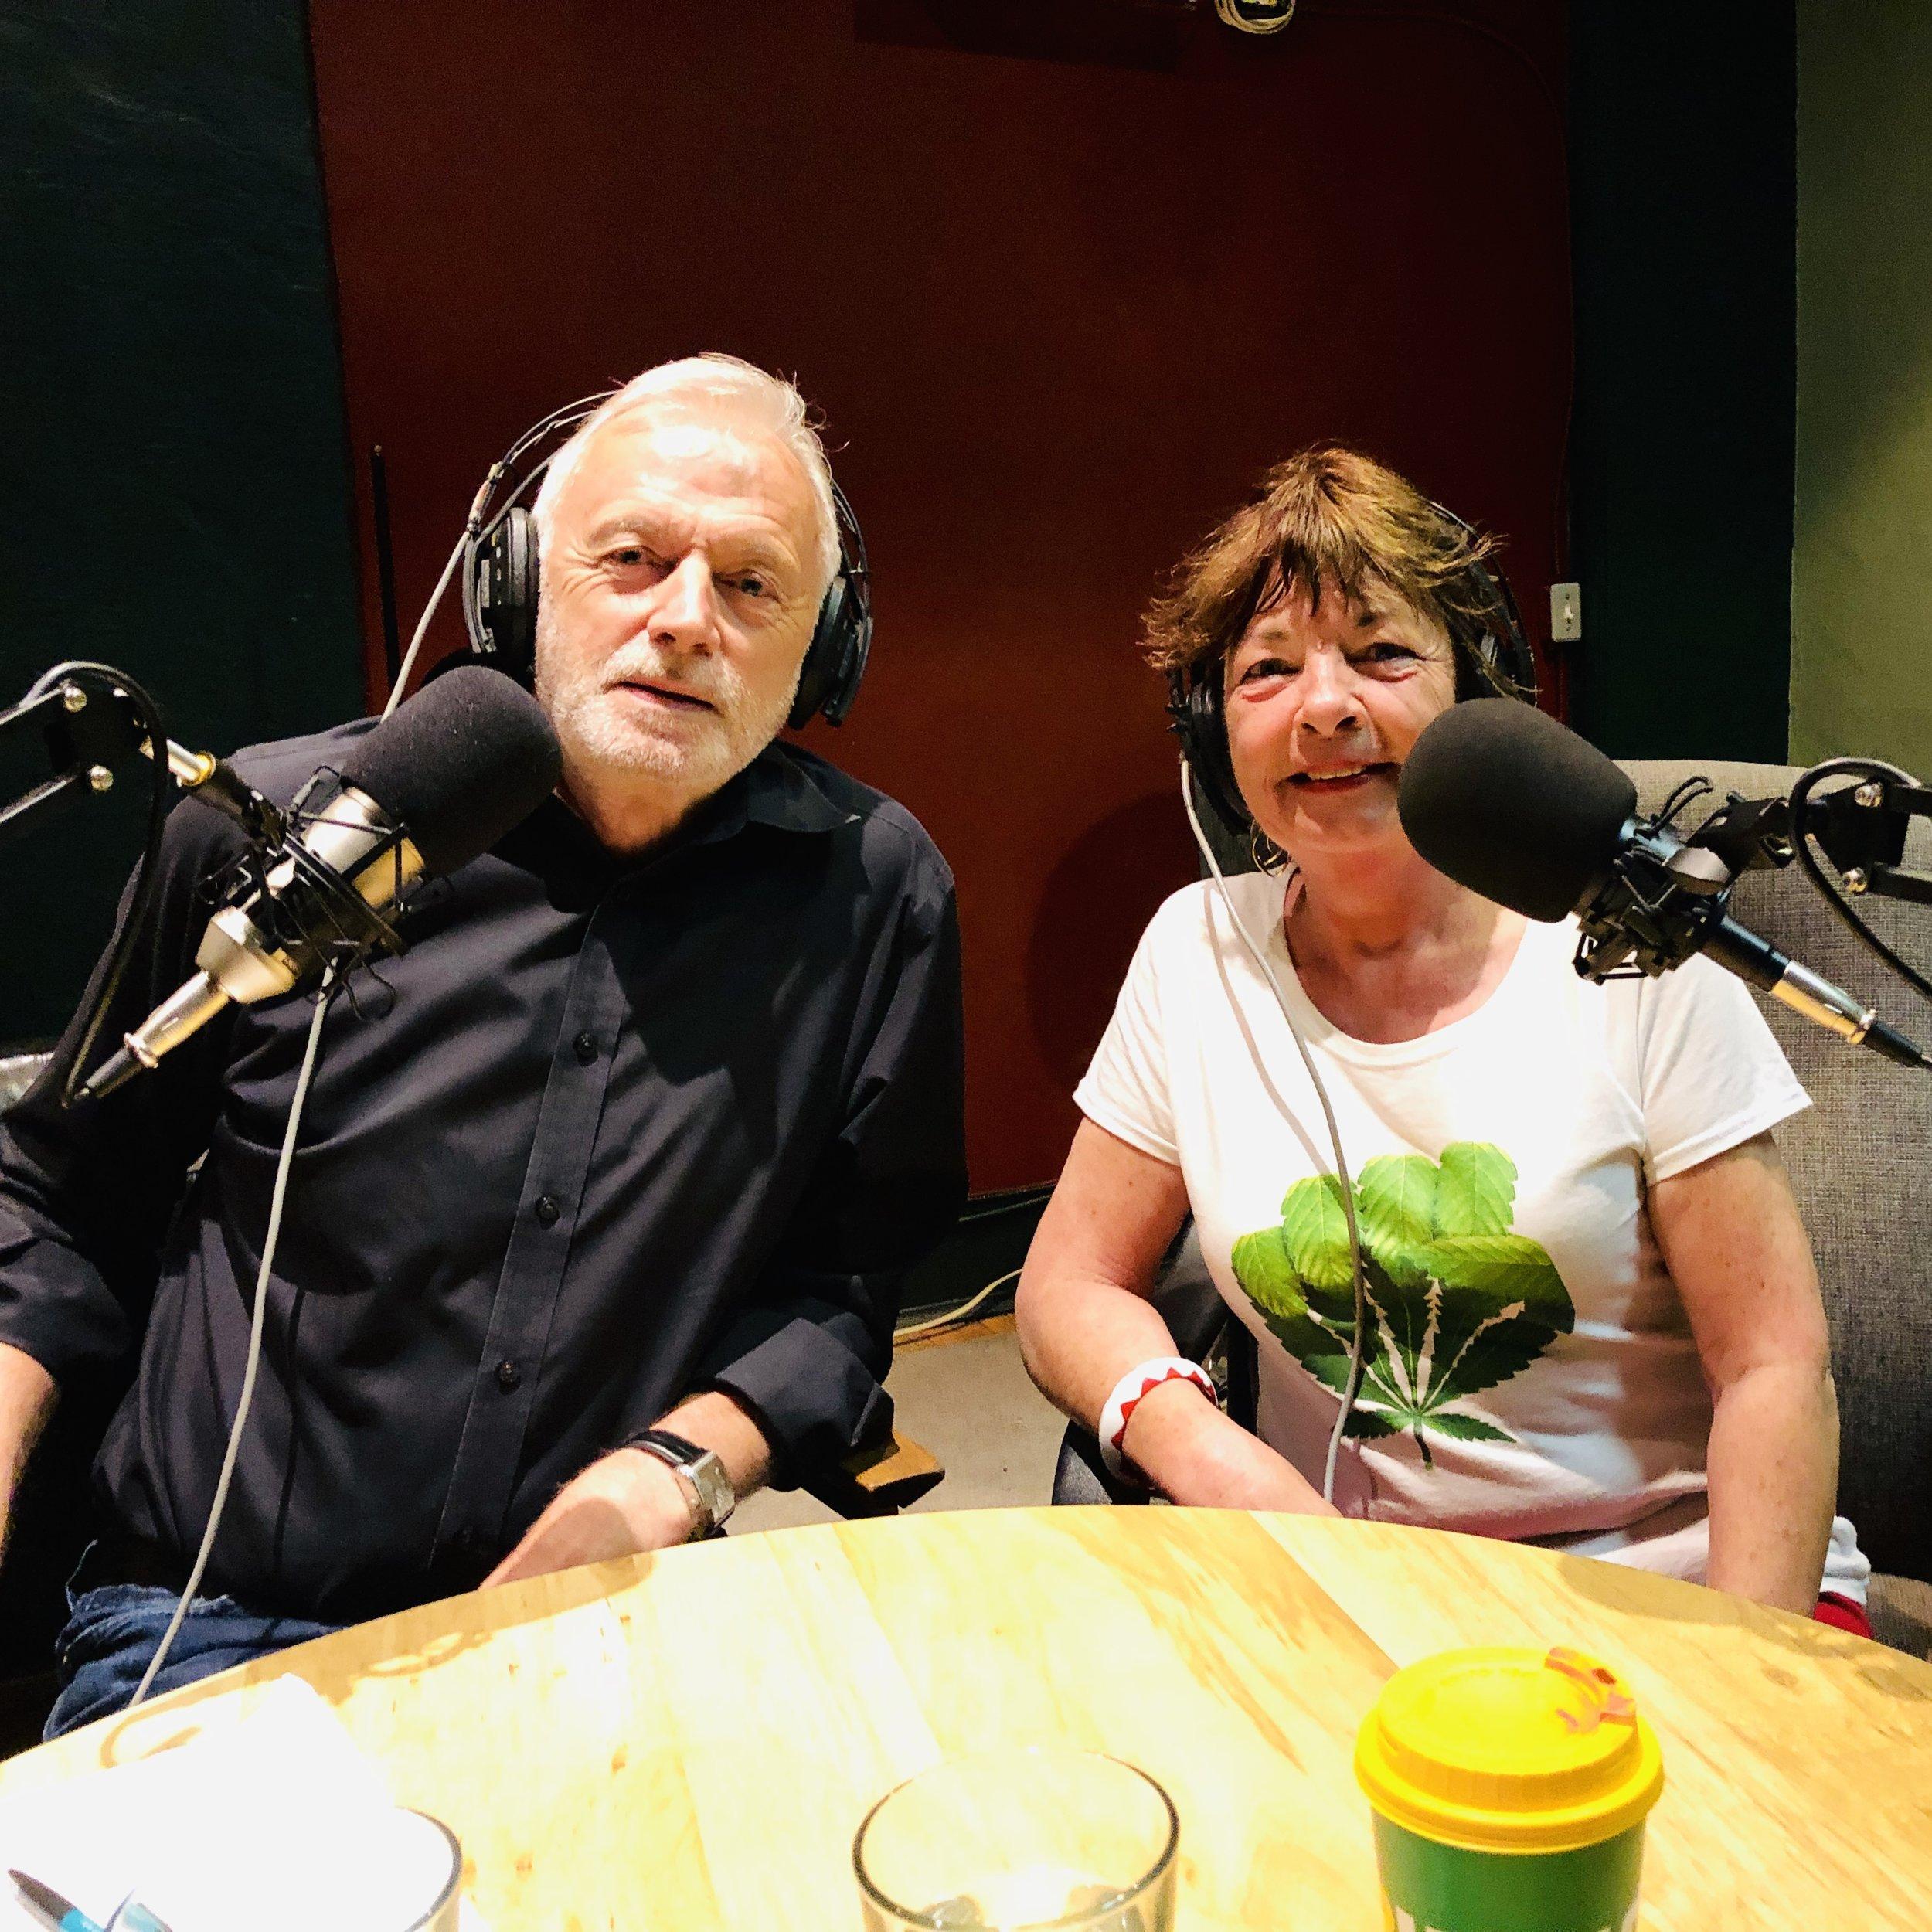 Ian Jessop & Corrie Yelland. Cannabis Health Radio Co-hosts.